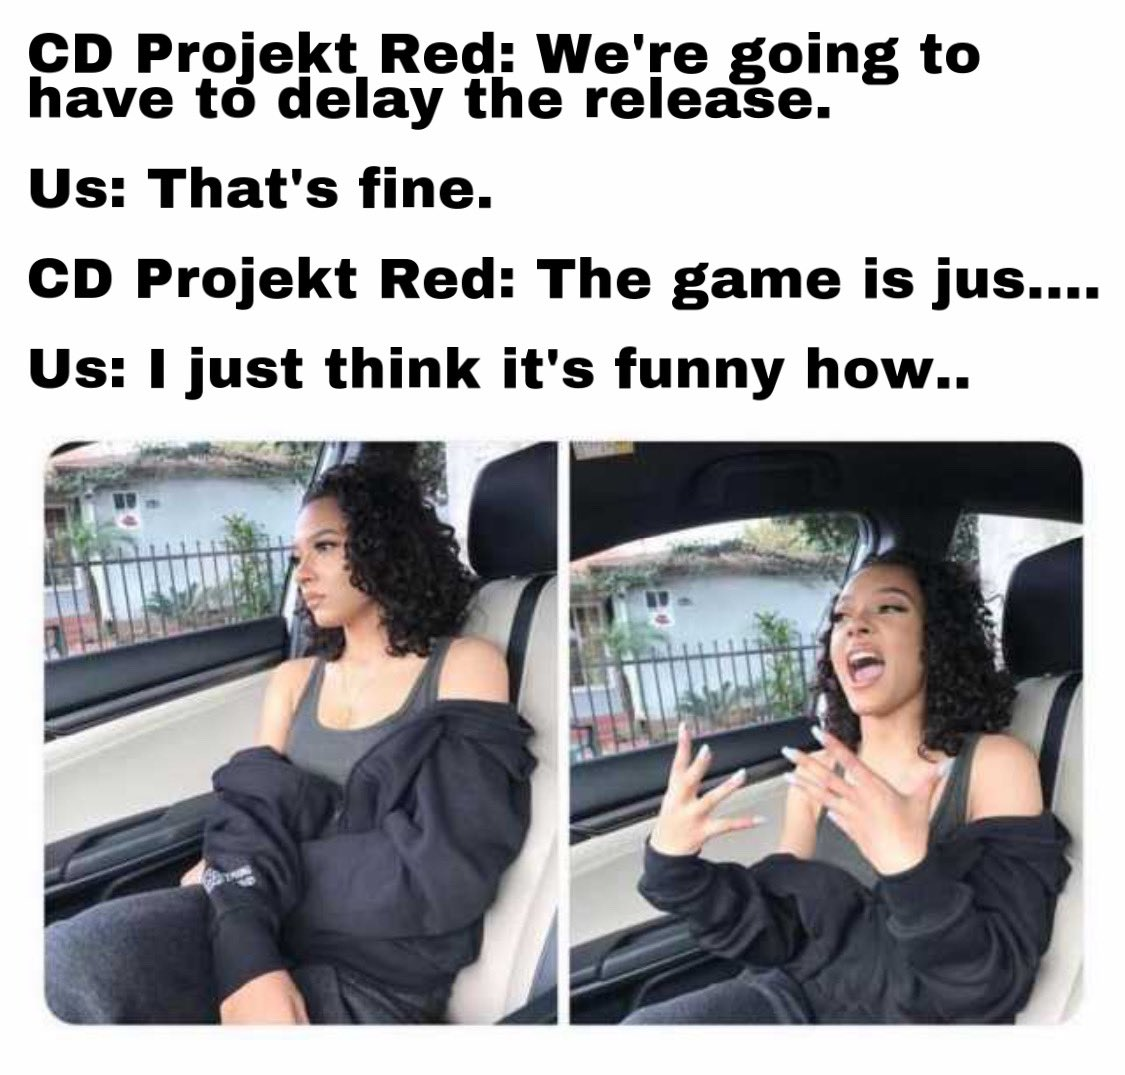 @CDPROJEKTRED #Cyberpunk2077 #CyberDelayed #CyberPunk @TwitterGaming #GameMeme pic.twitter.com/6r2ivcPWVr